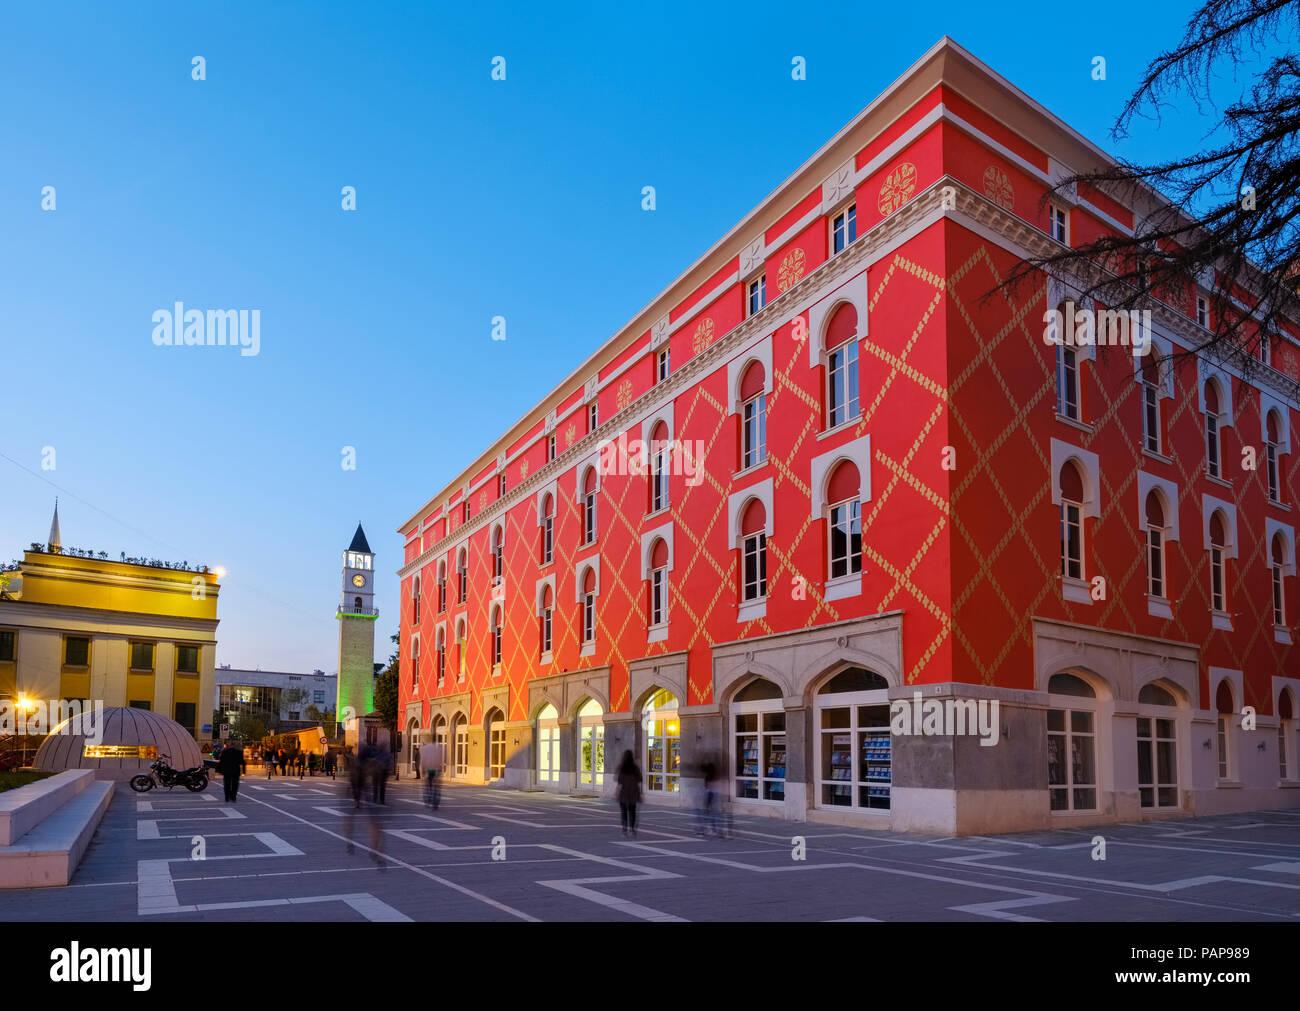 Albania, Tirana, Clock tower and Minstry of Urban Development, blue hour - Stock Image